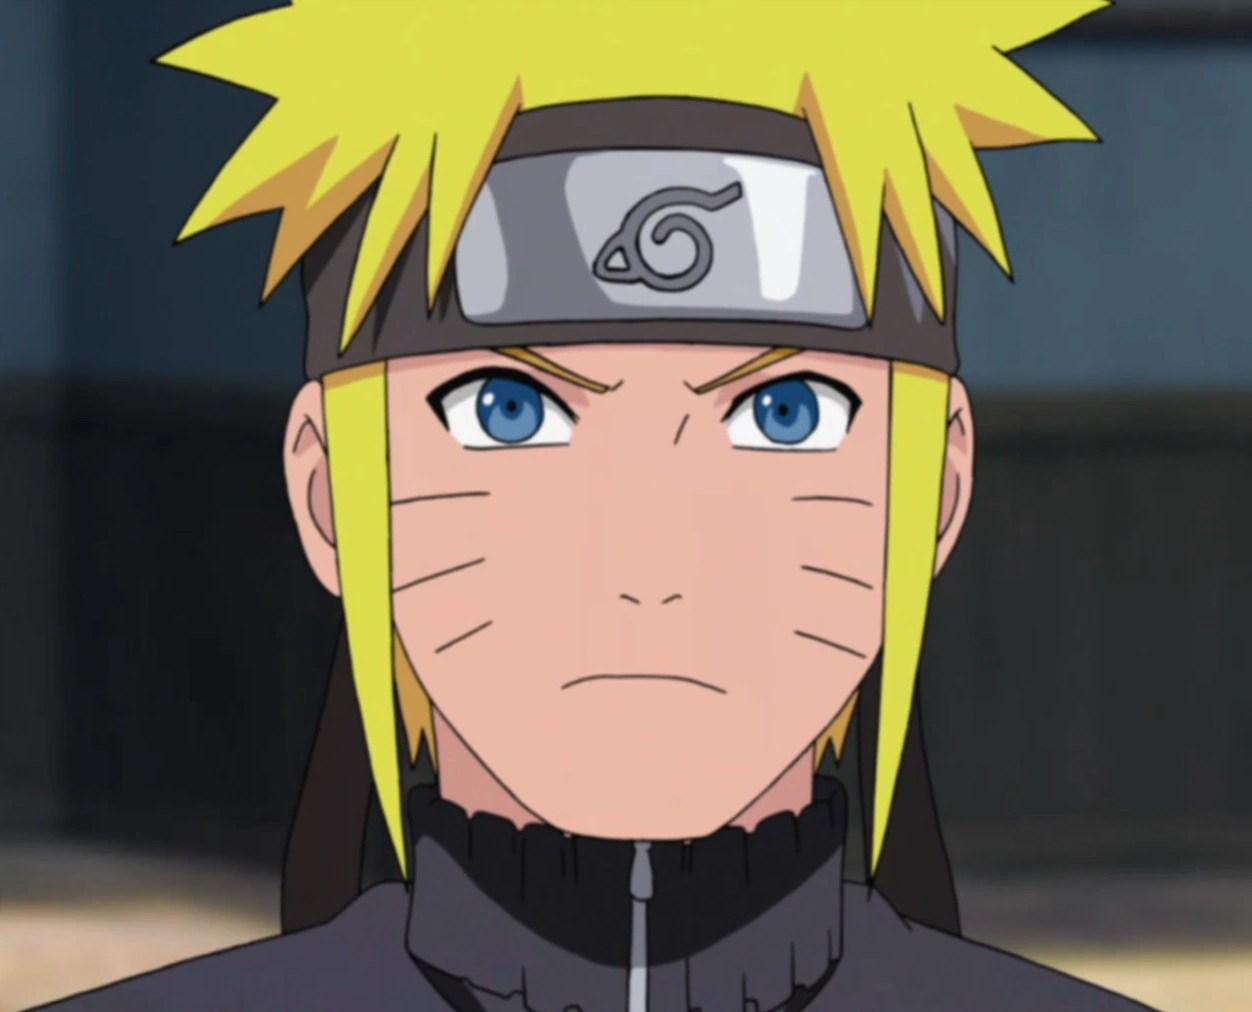 Tenten (テンテン, tenten) is a kunoichi of konohagakure. Menma Namikaze   Wiki Naruto   Fandom